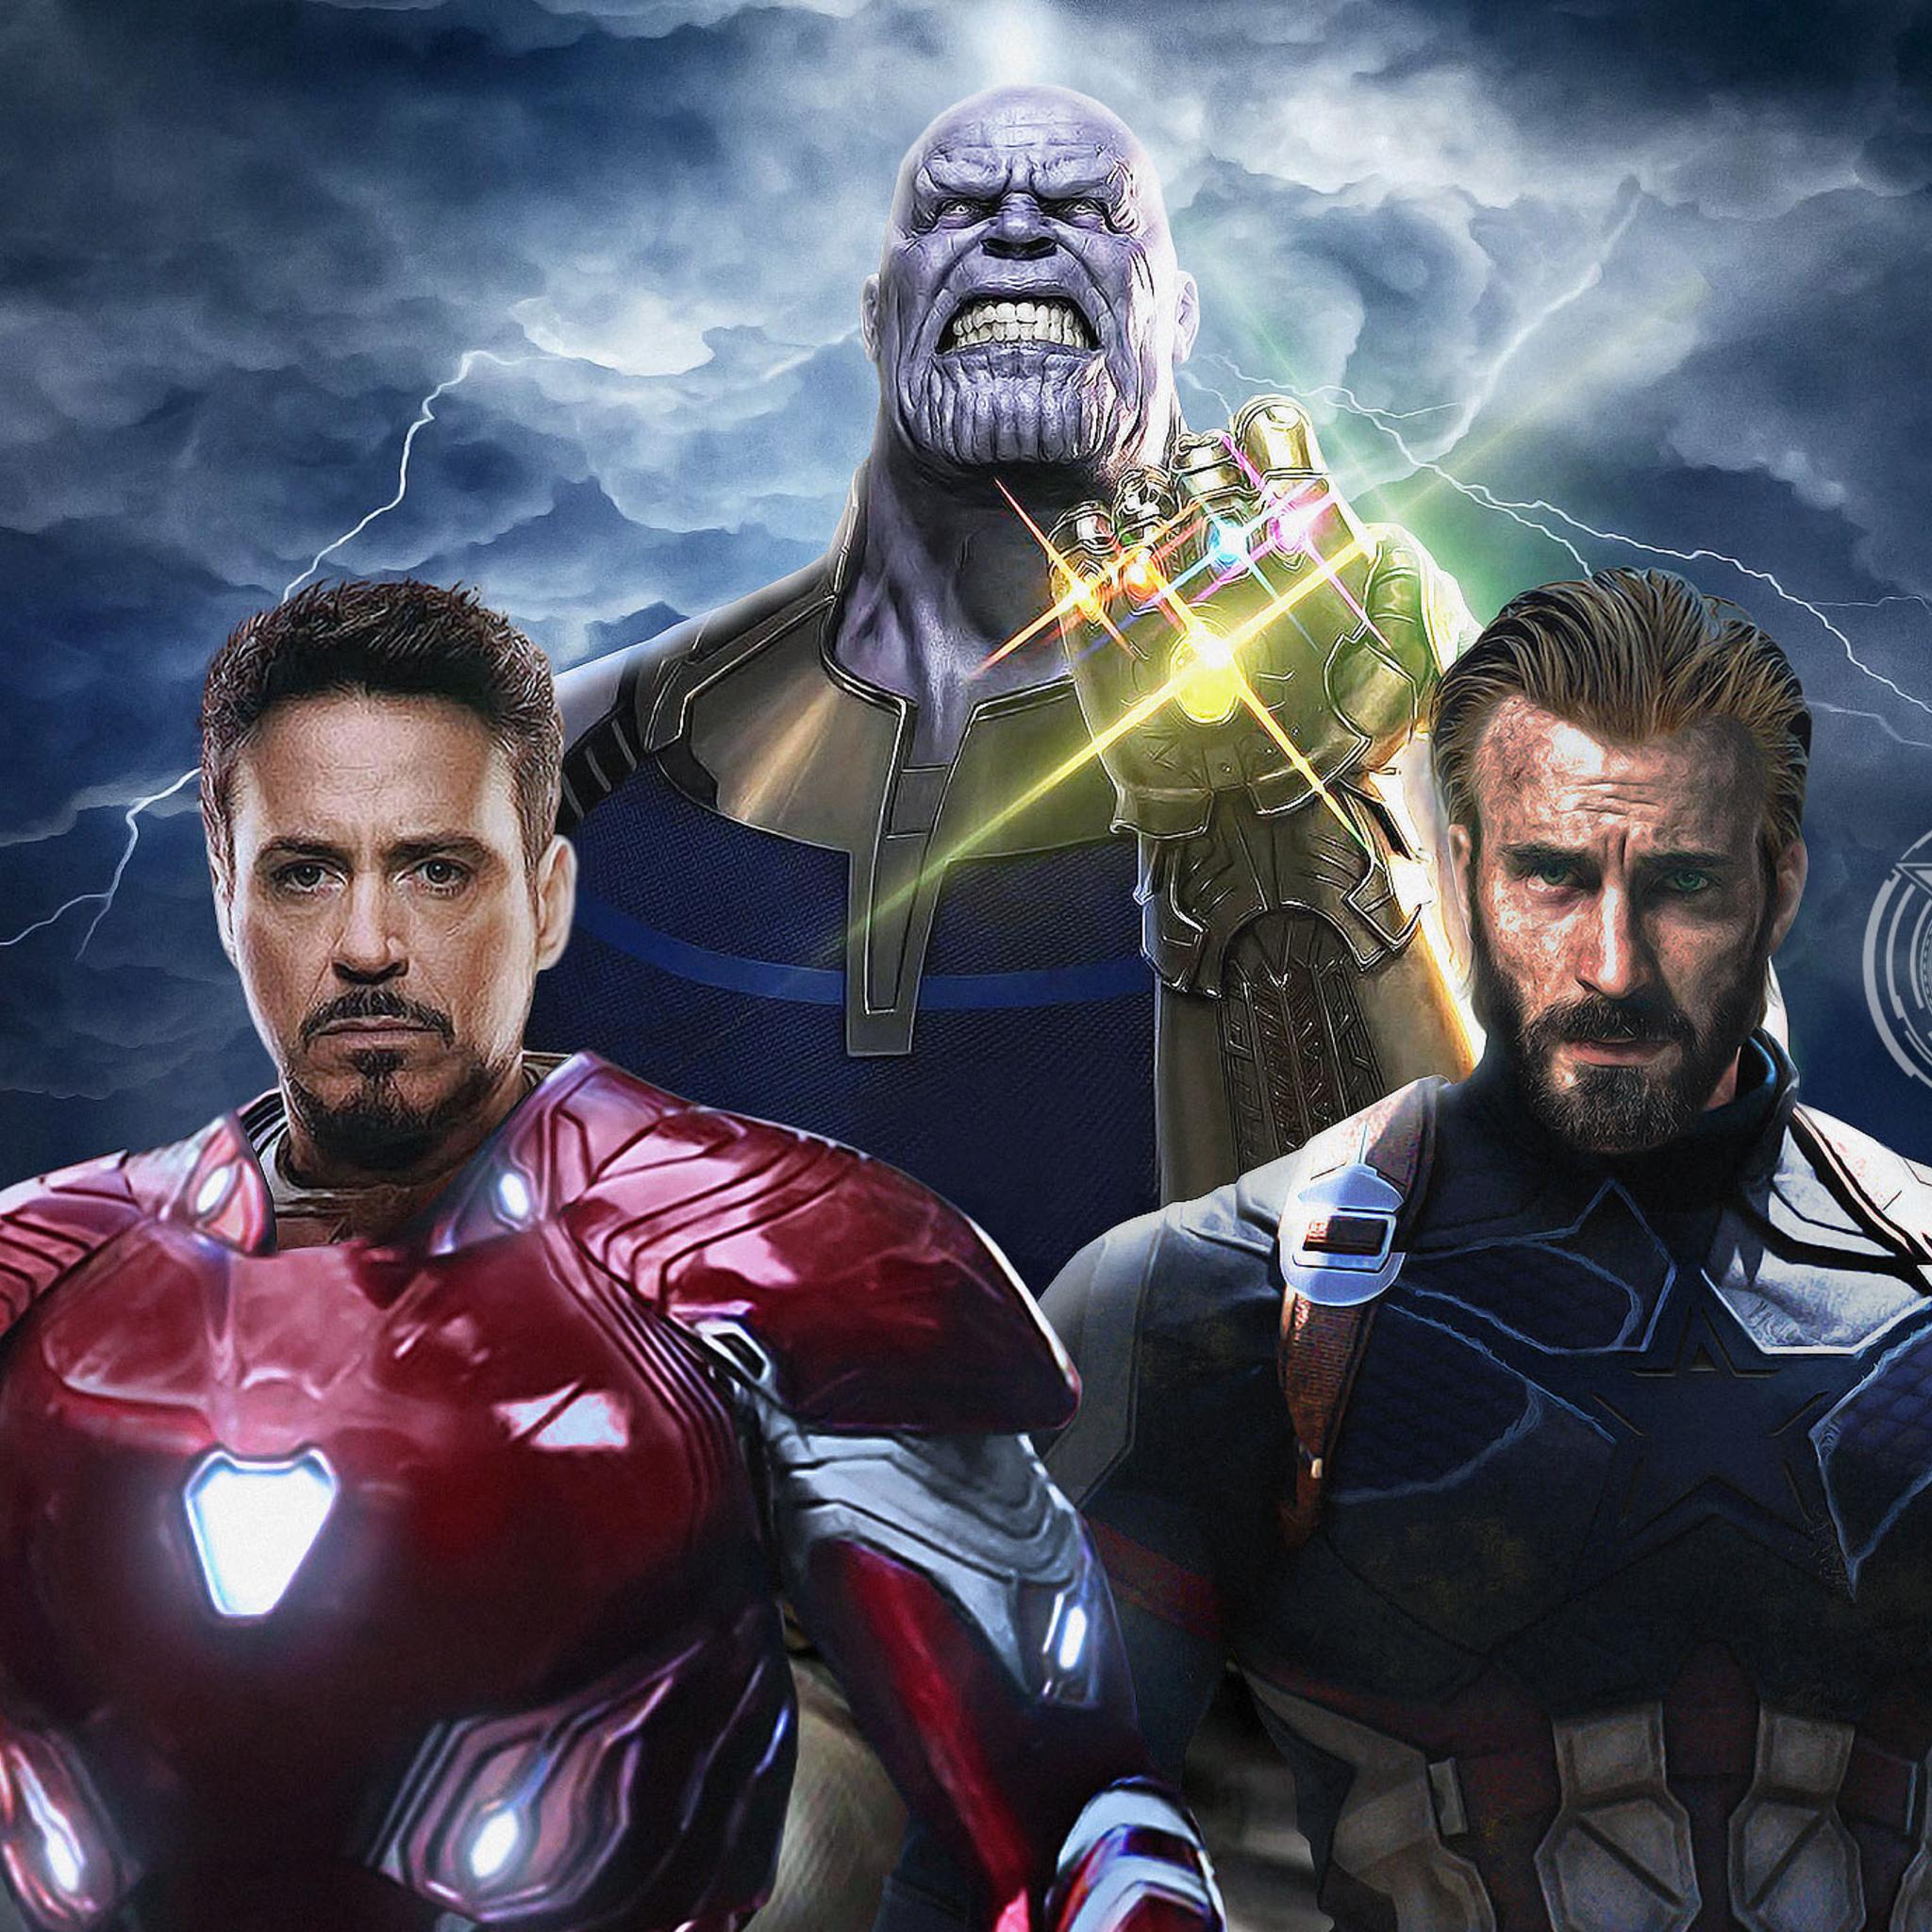 2048x2048 avengers infinity war captain america iron man thanos ipad